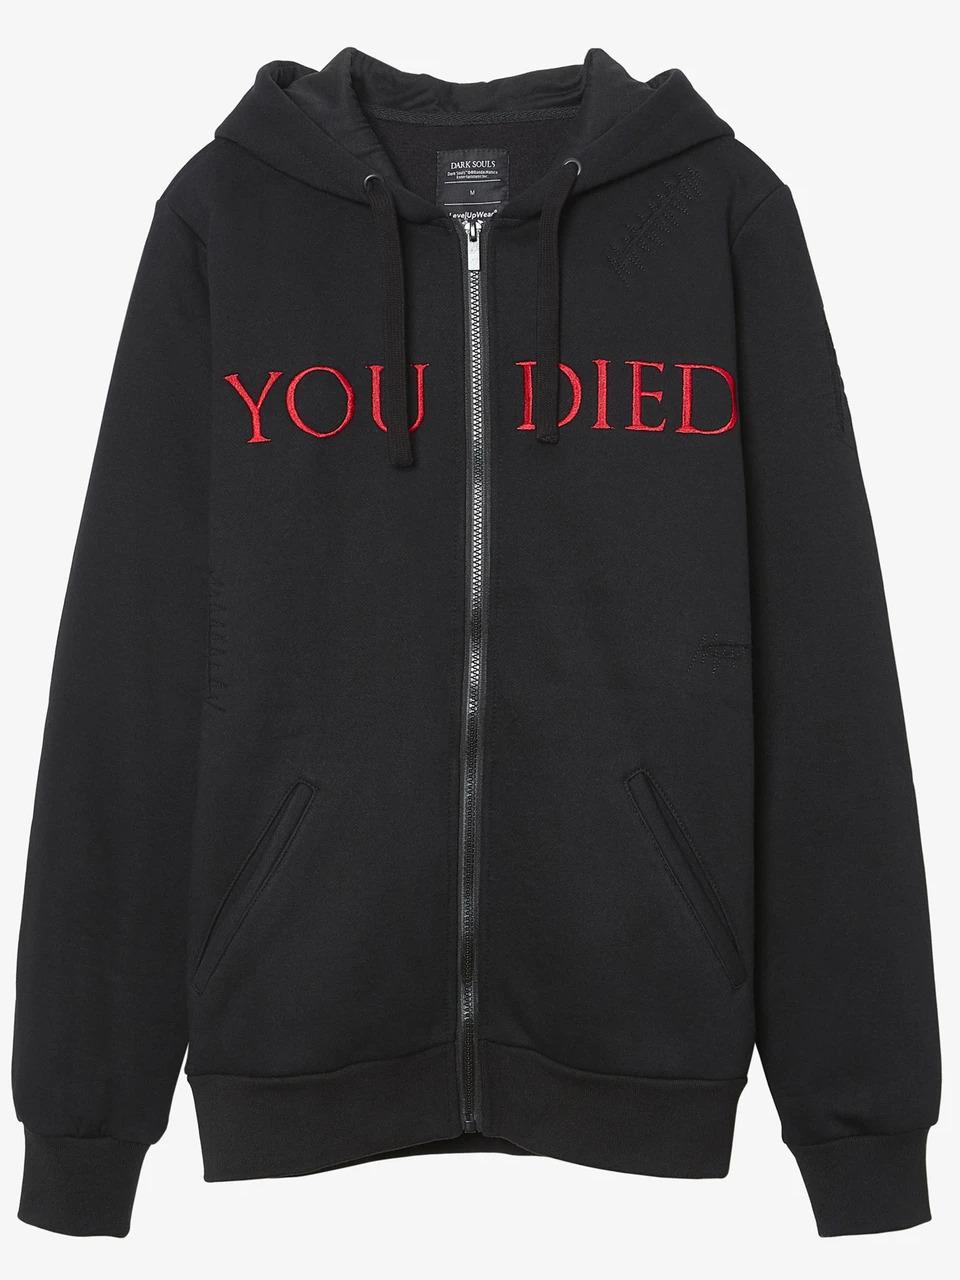 Mikina Dark Souls - You Died (velikost XL) (PC)